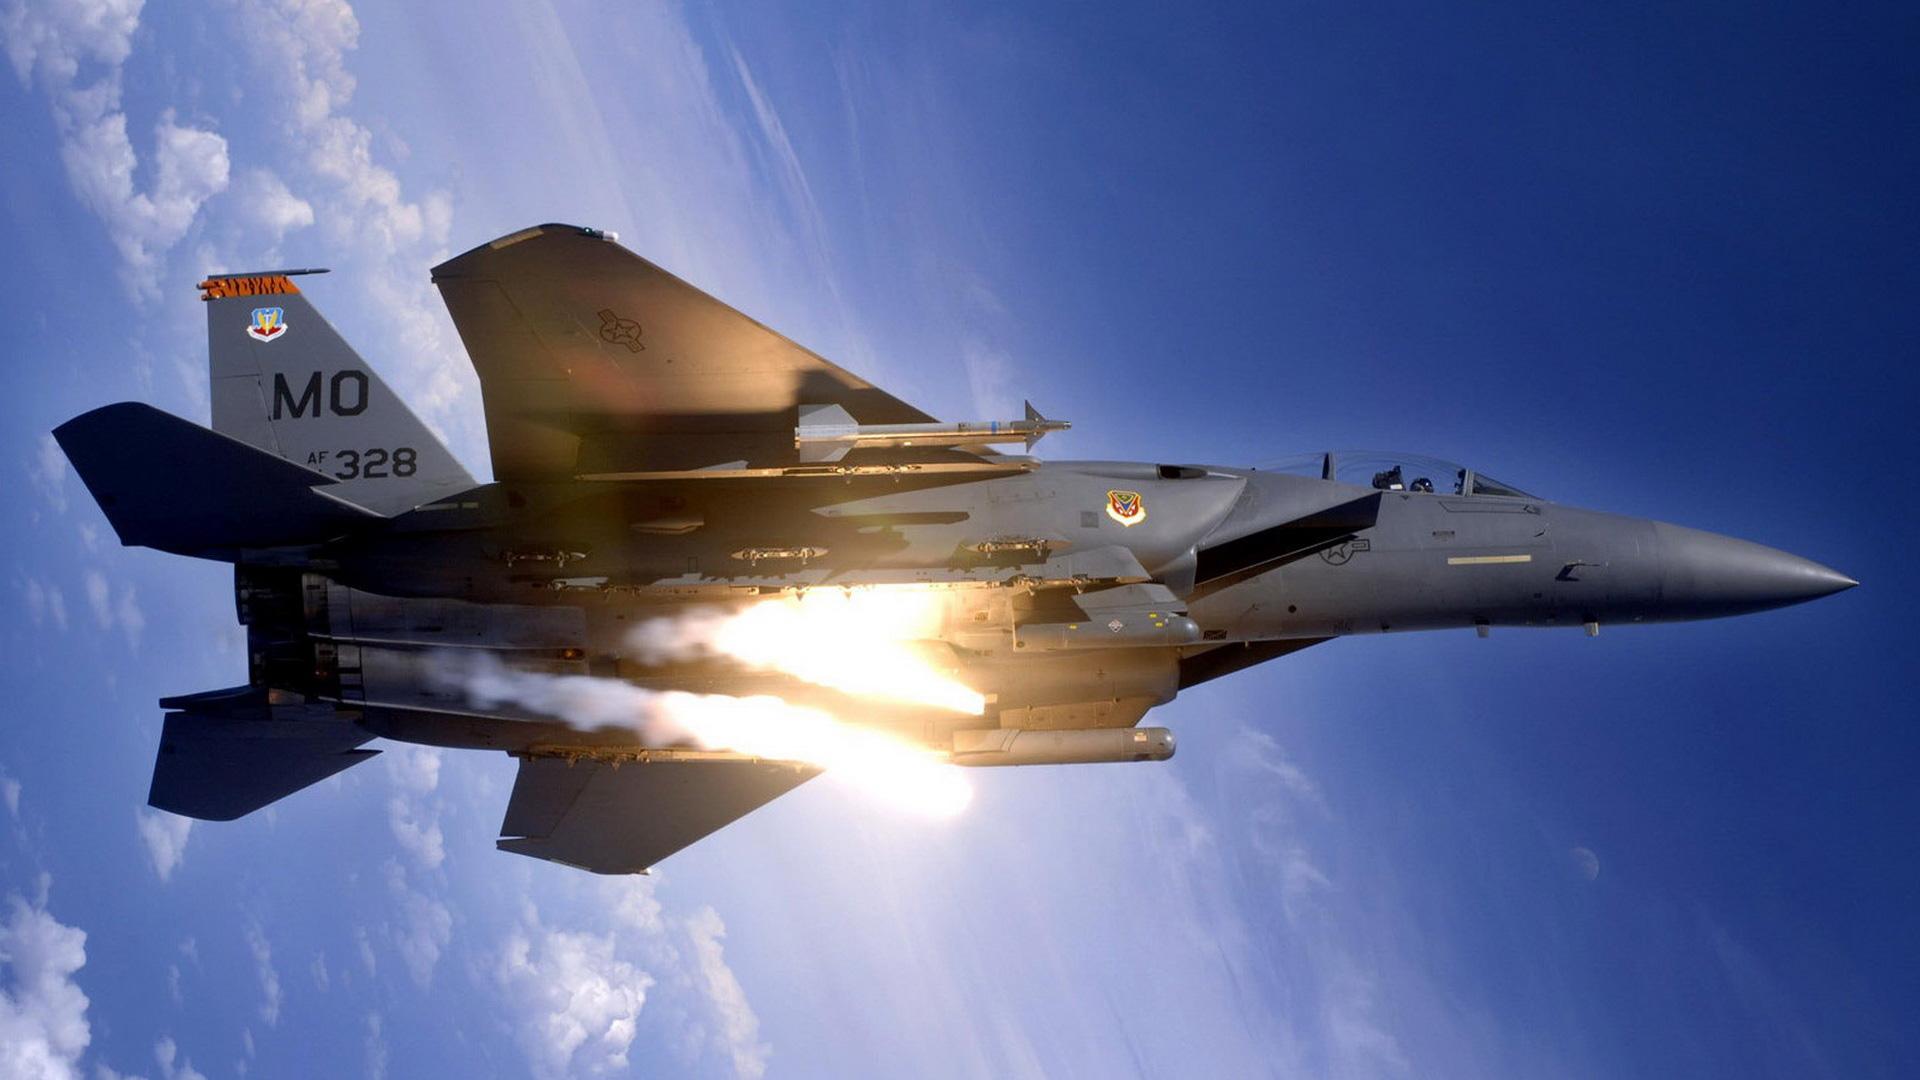 F15 Eagle Jet 1920x1080 HD Image Aircraft Jet Fighter 1920x1080